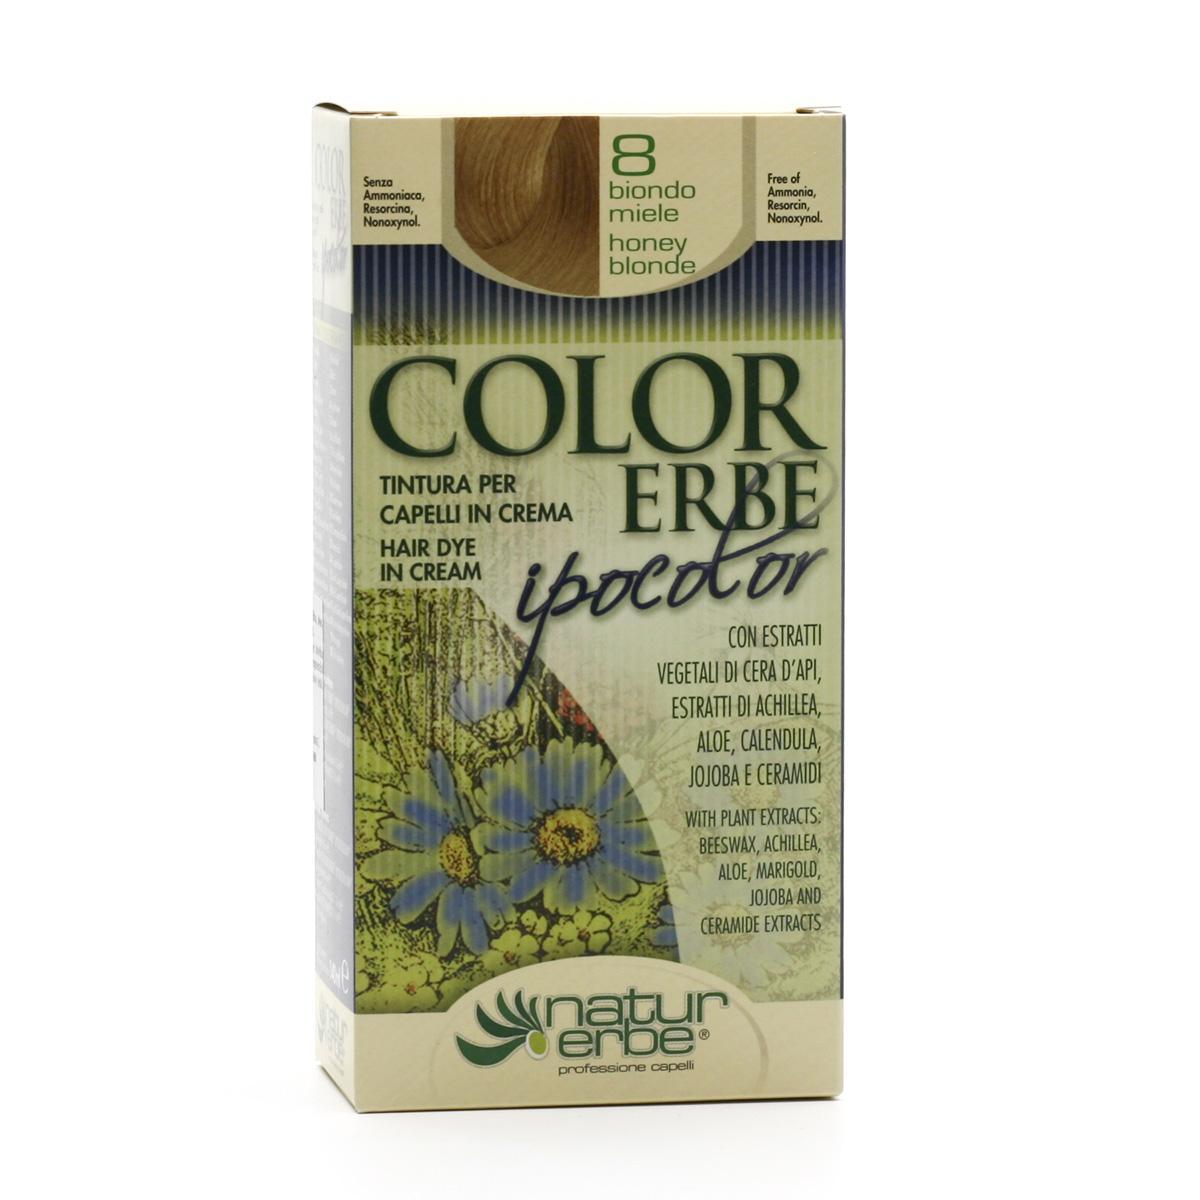 Color Erbe Barva na vlasy Medová blond 08, Ipocolor 140 ml